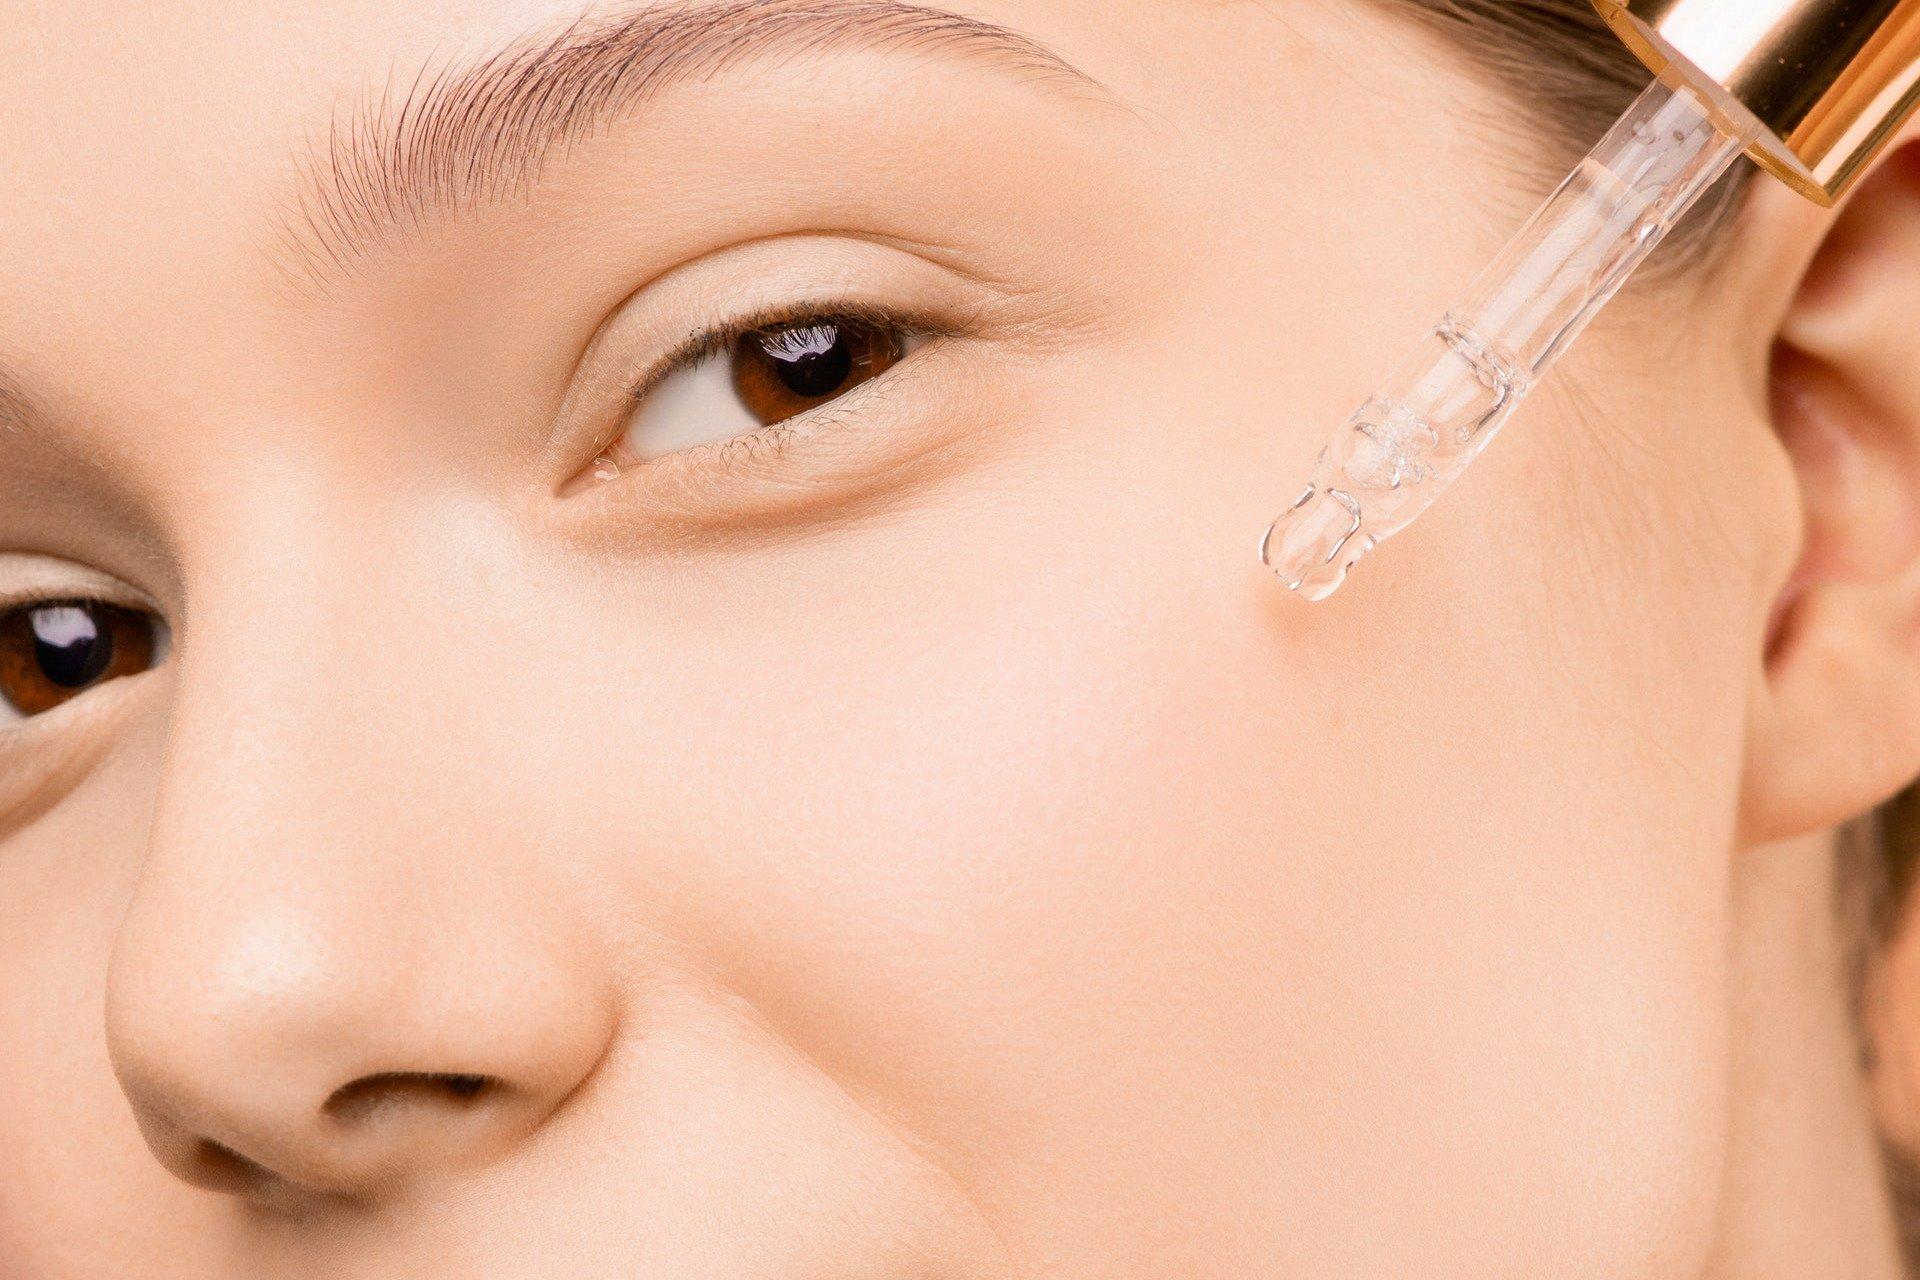 Woman applying a serum